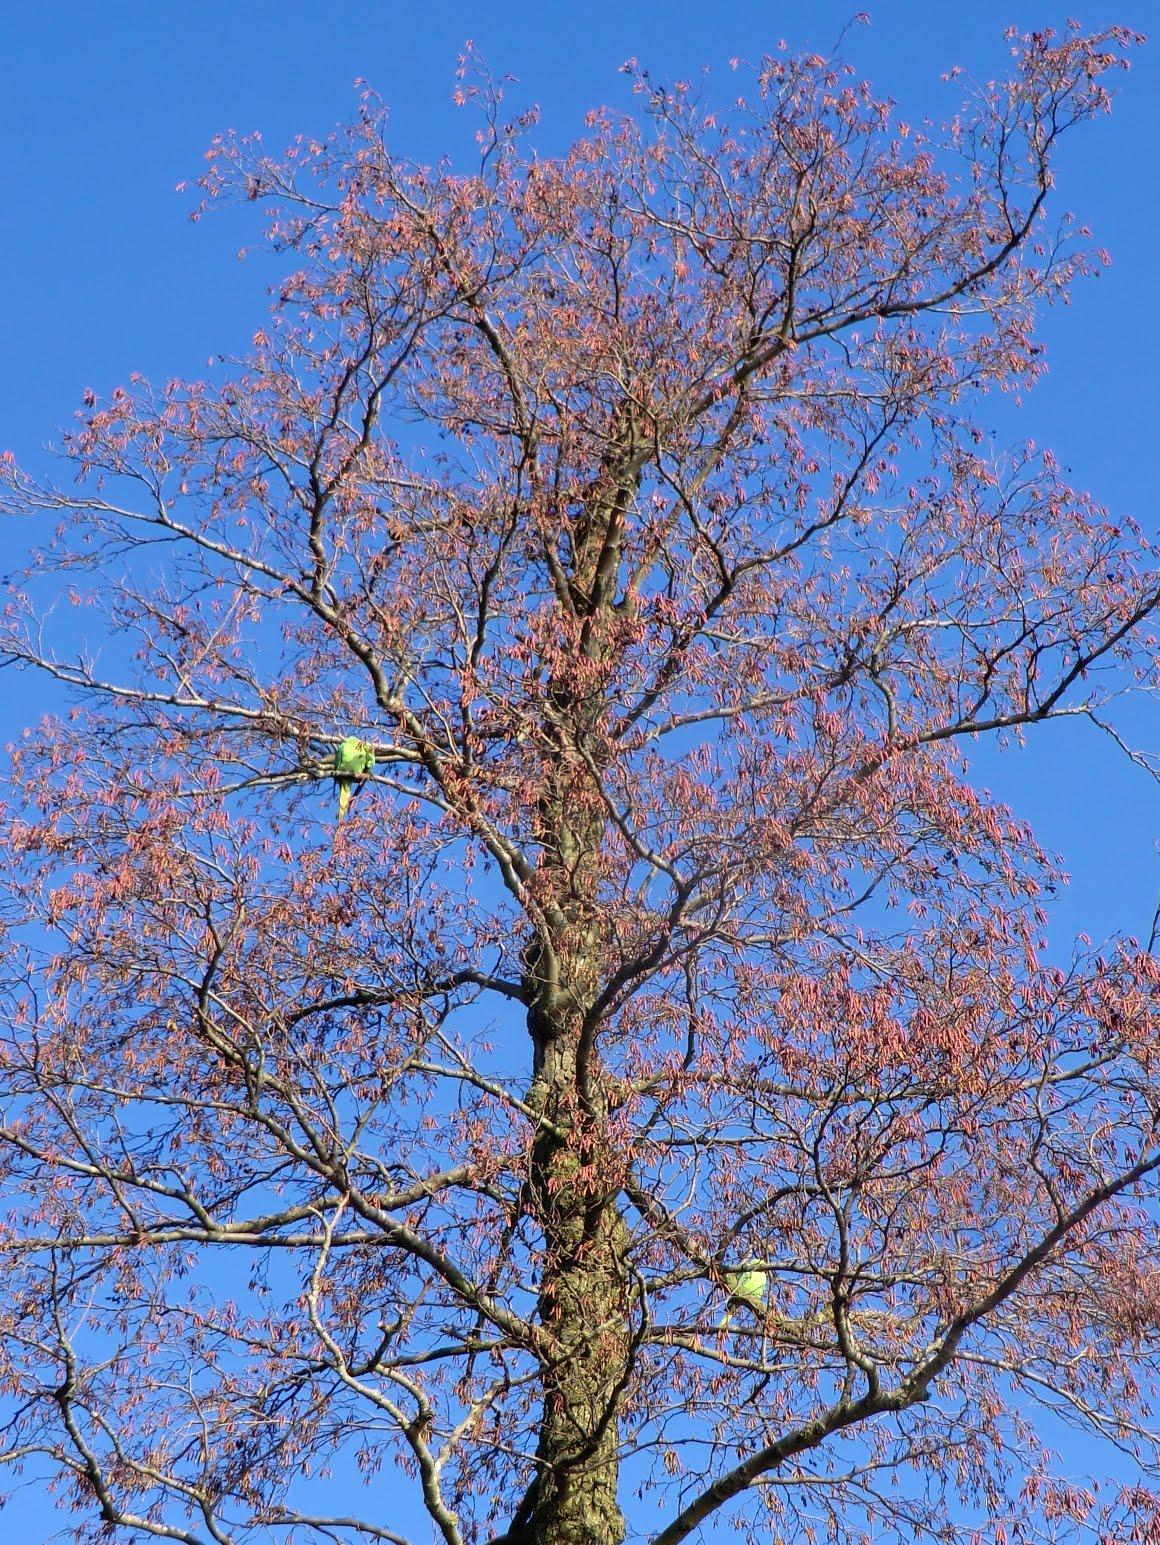 CIMG2328 Tree with parakeets, Richmond Park